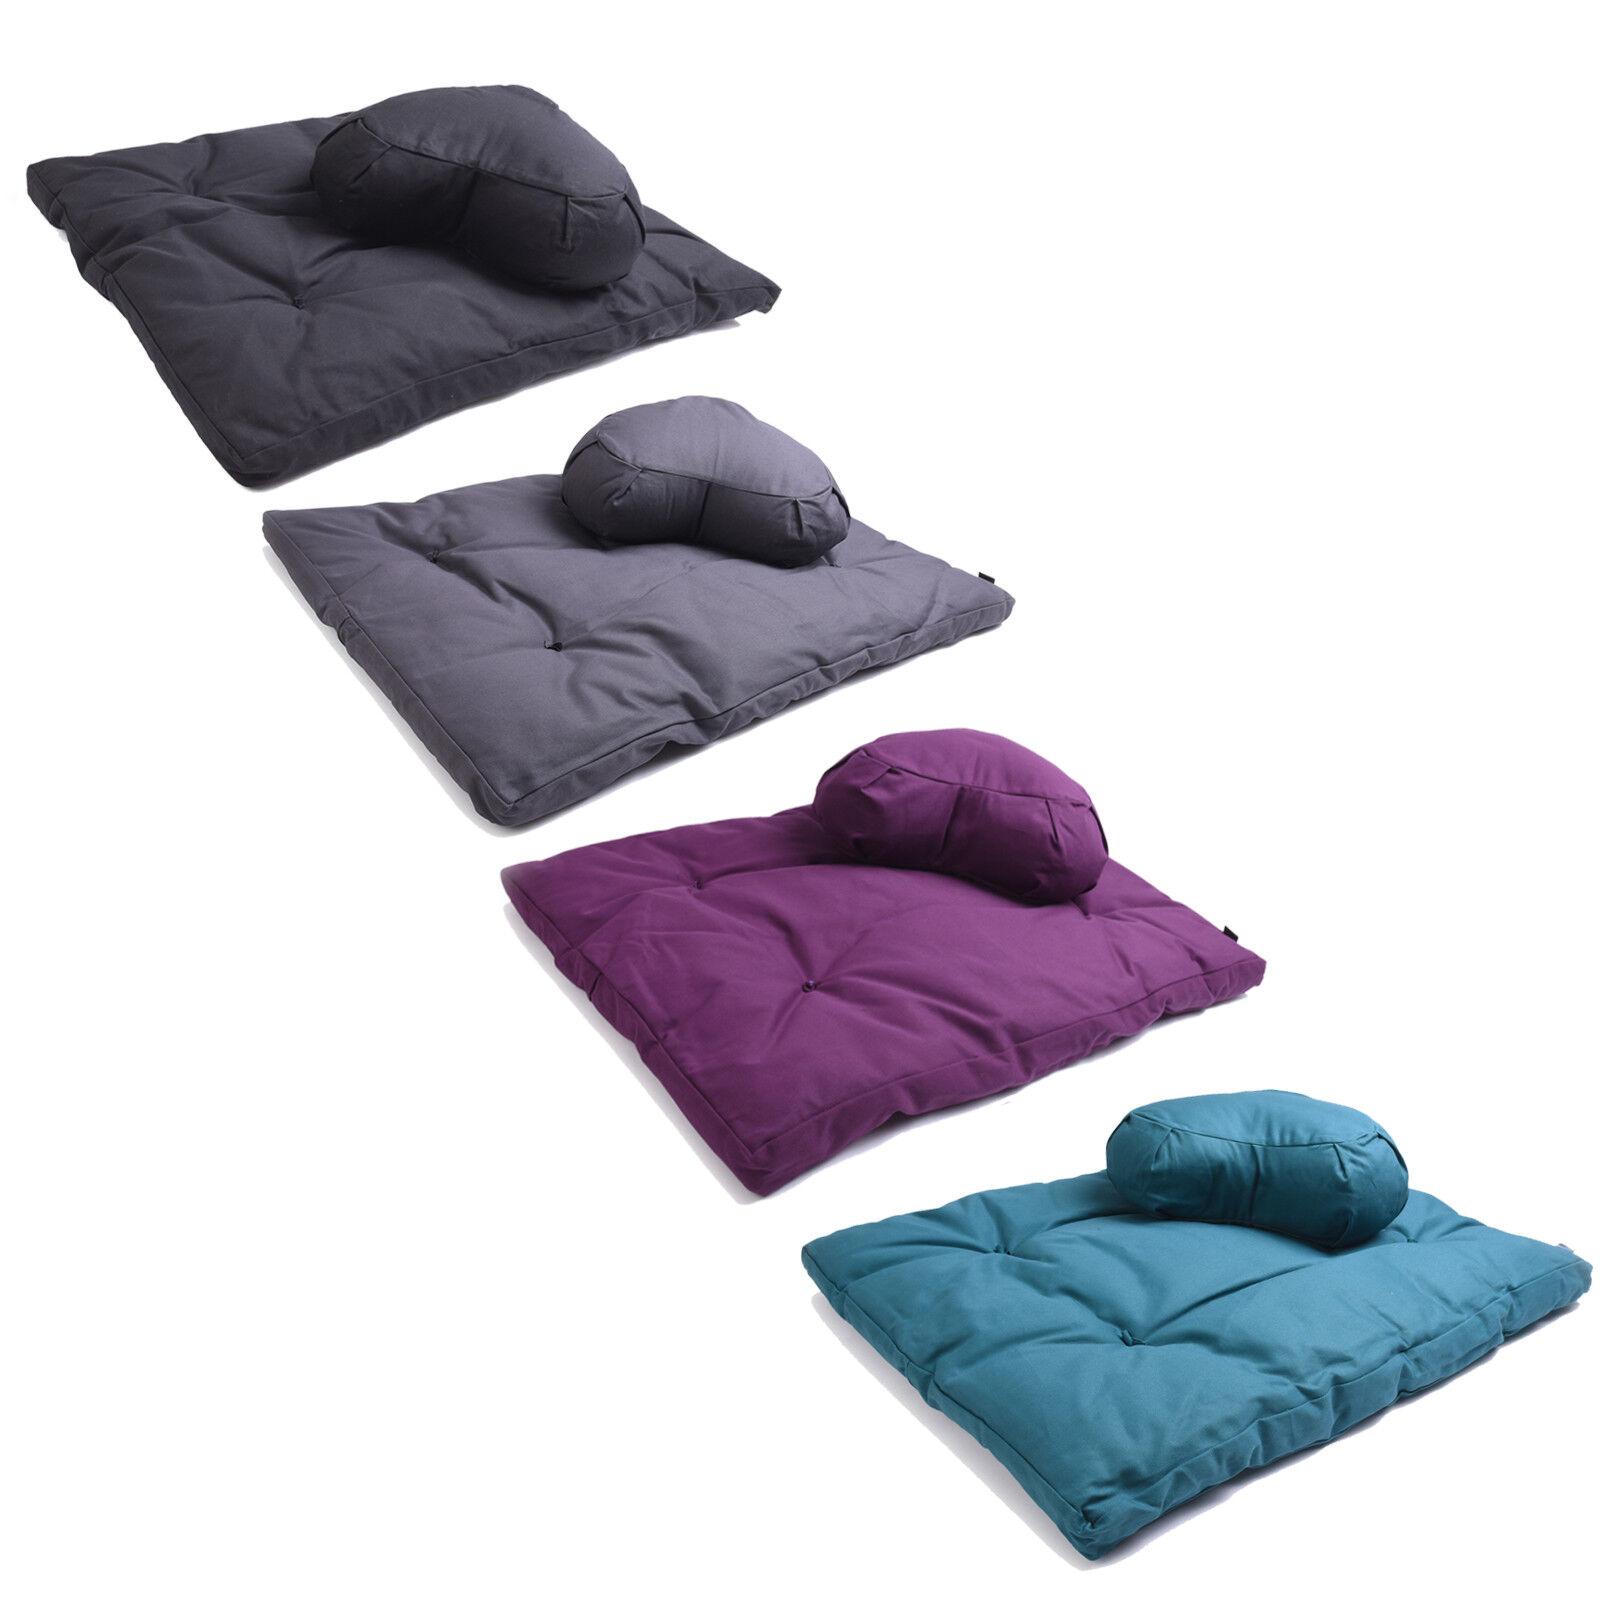 Yoga Studio EU Organic Zabuton & Crescent Cushion Meditation Kit